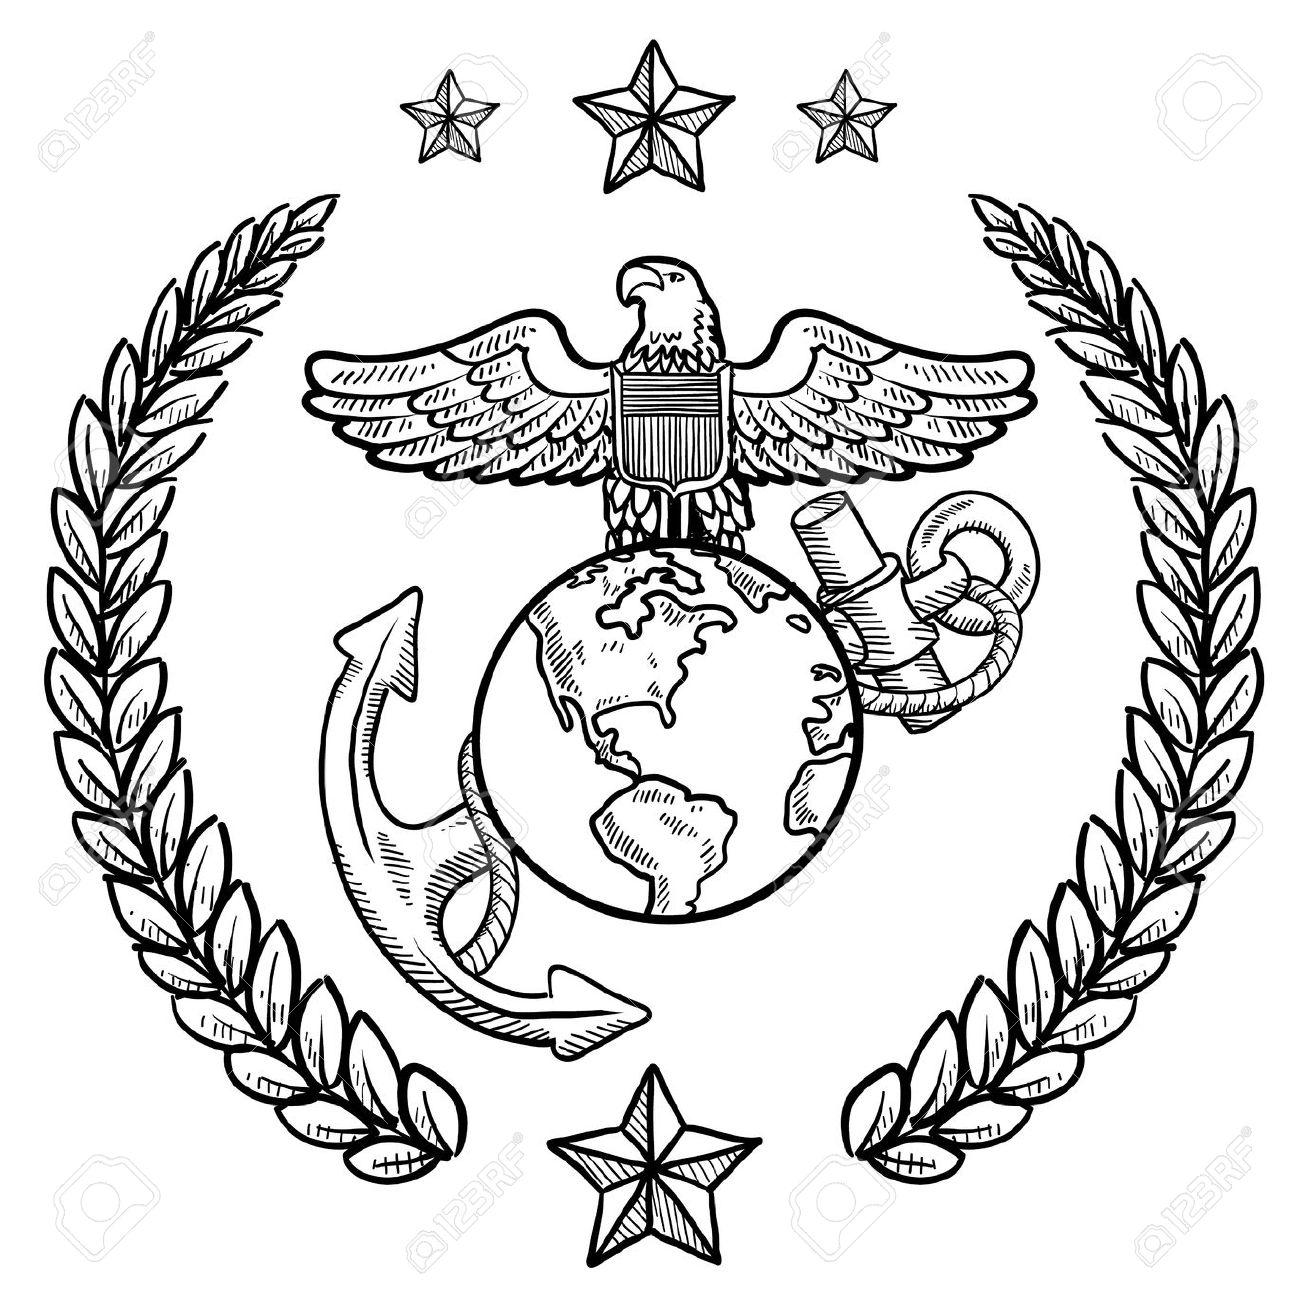 marine corps: Doodle style .